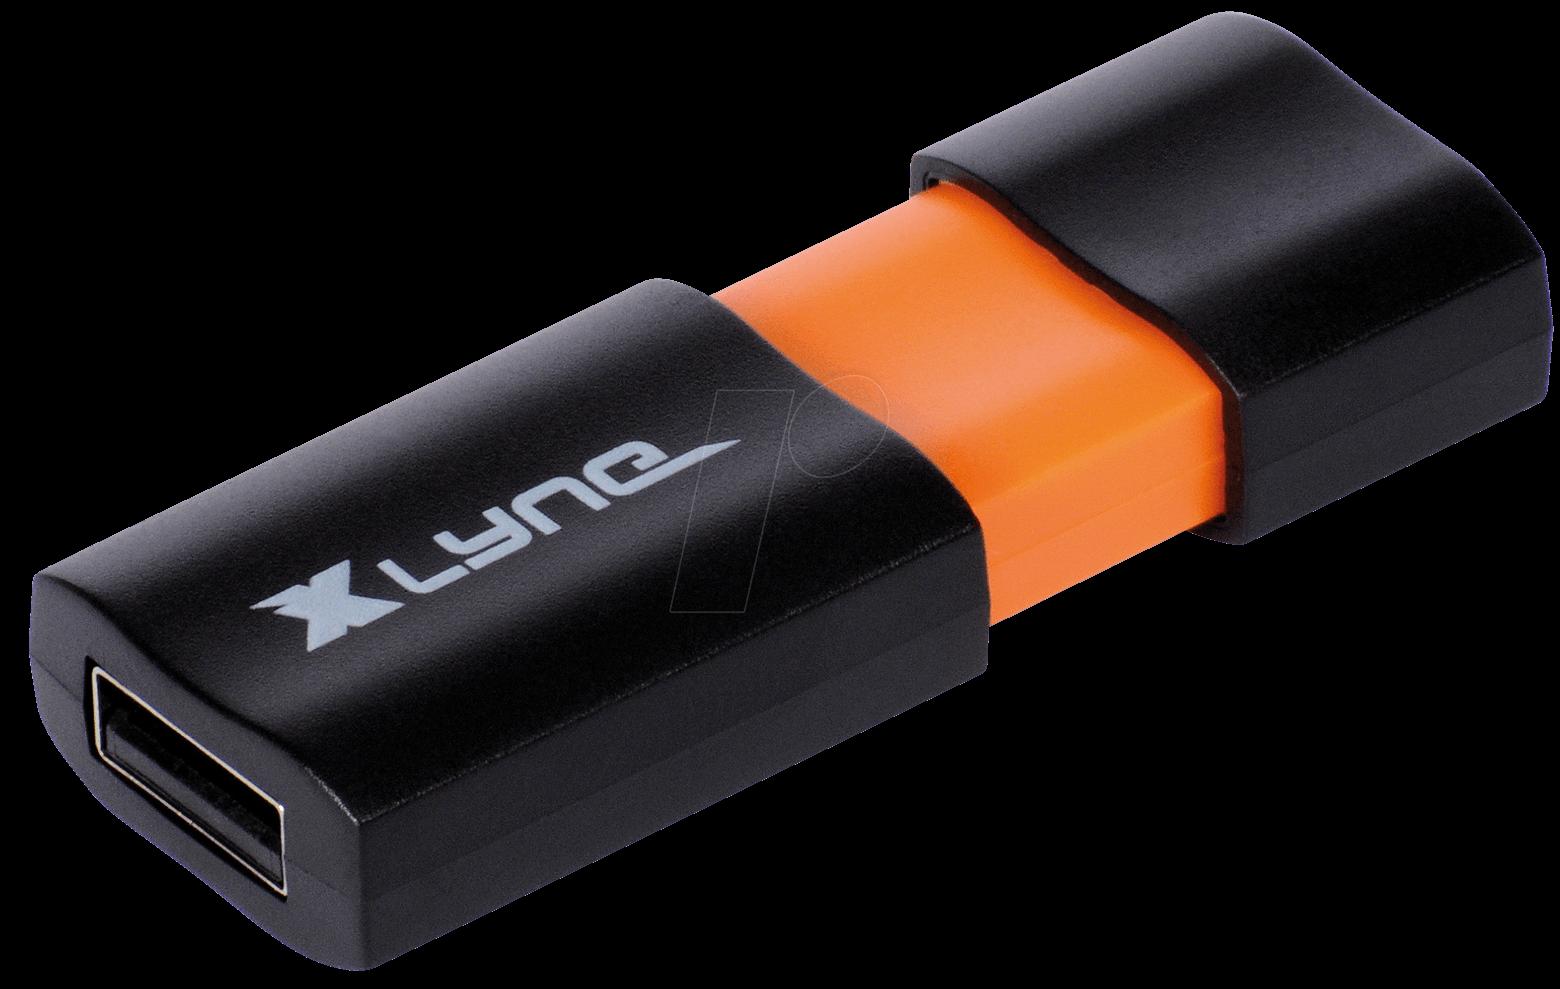 XLYNE 7104000 - USB-Stick, USB 2.0, 4 GB, WAVE